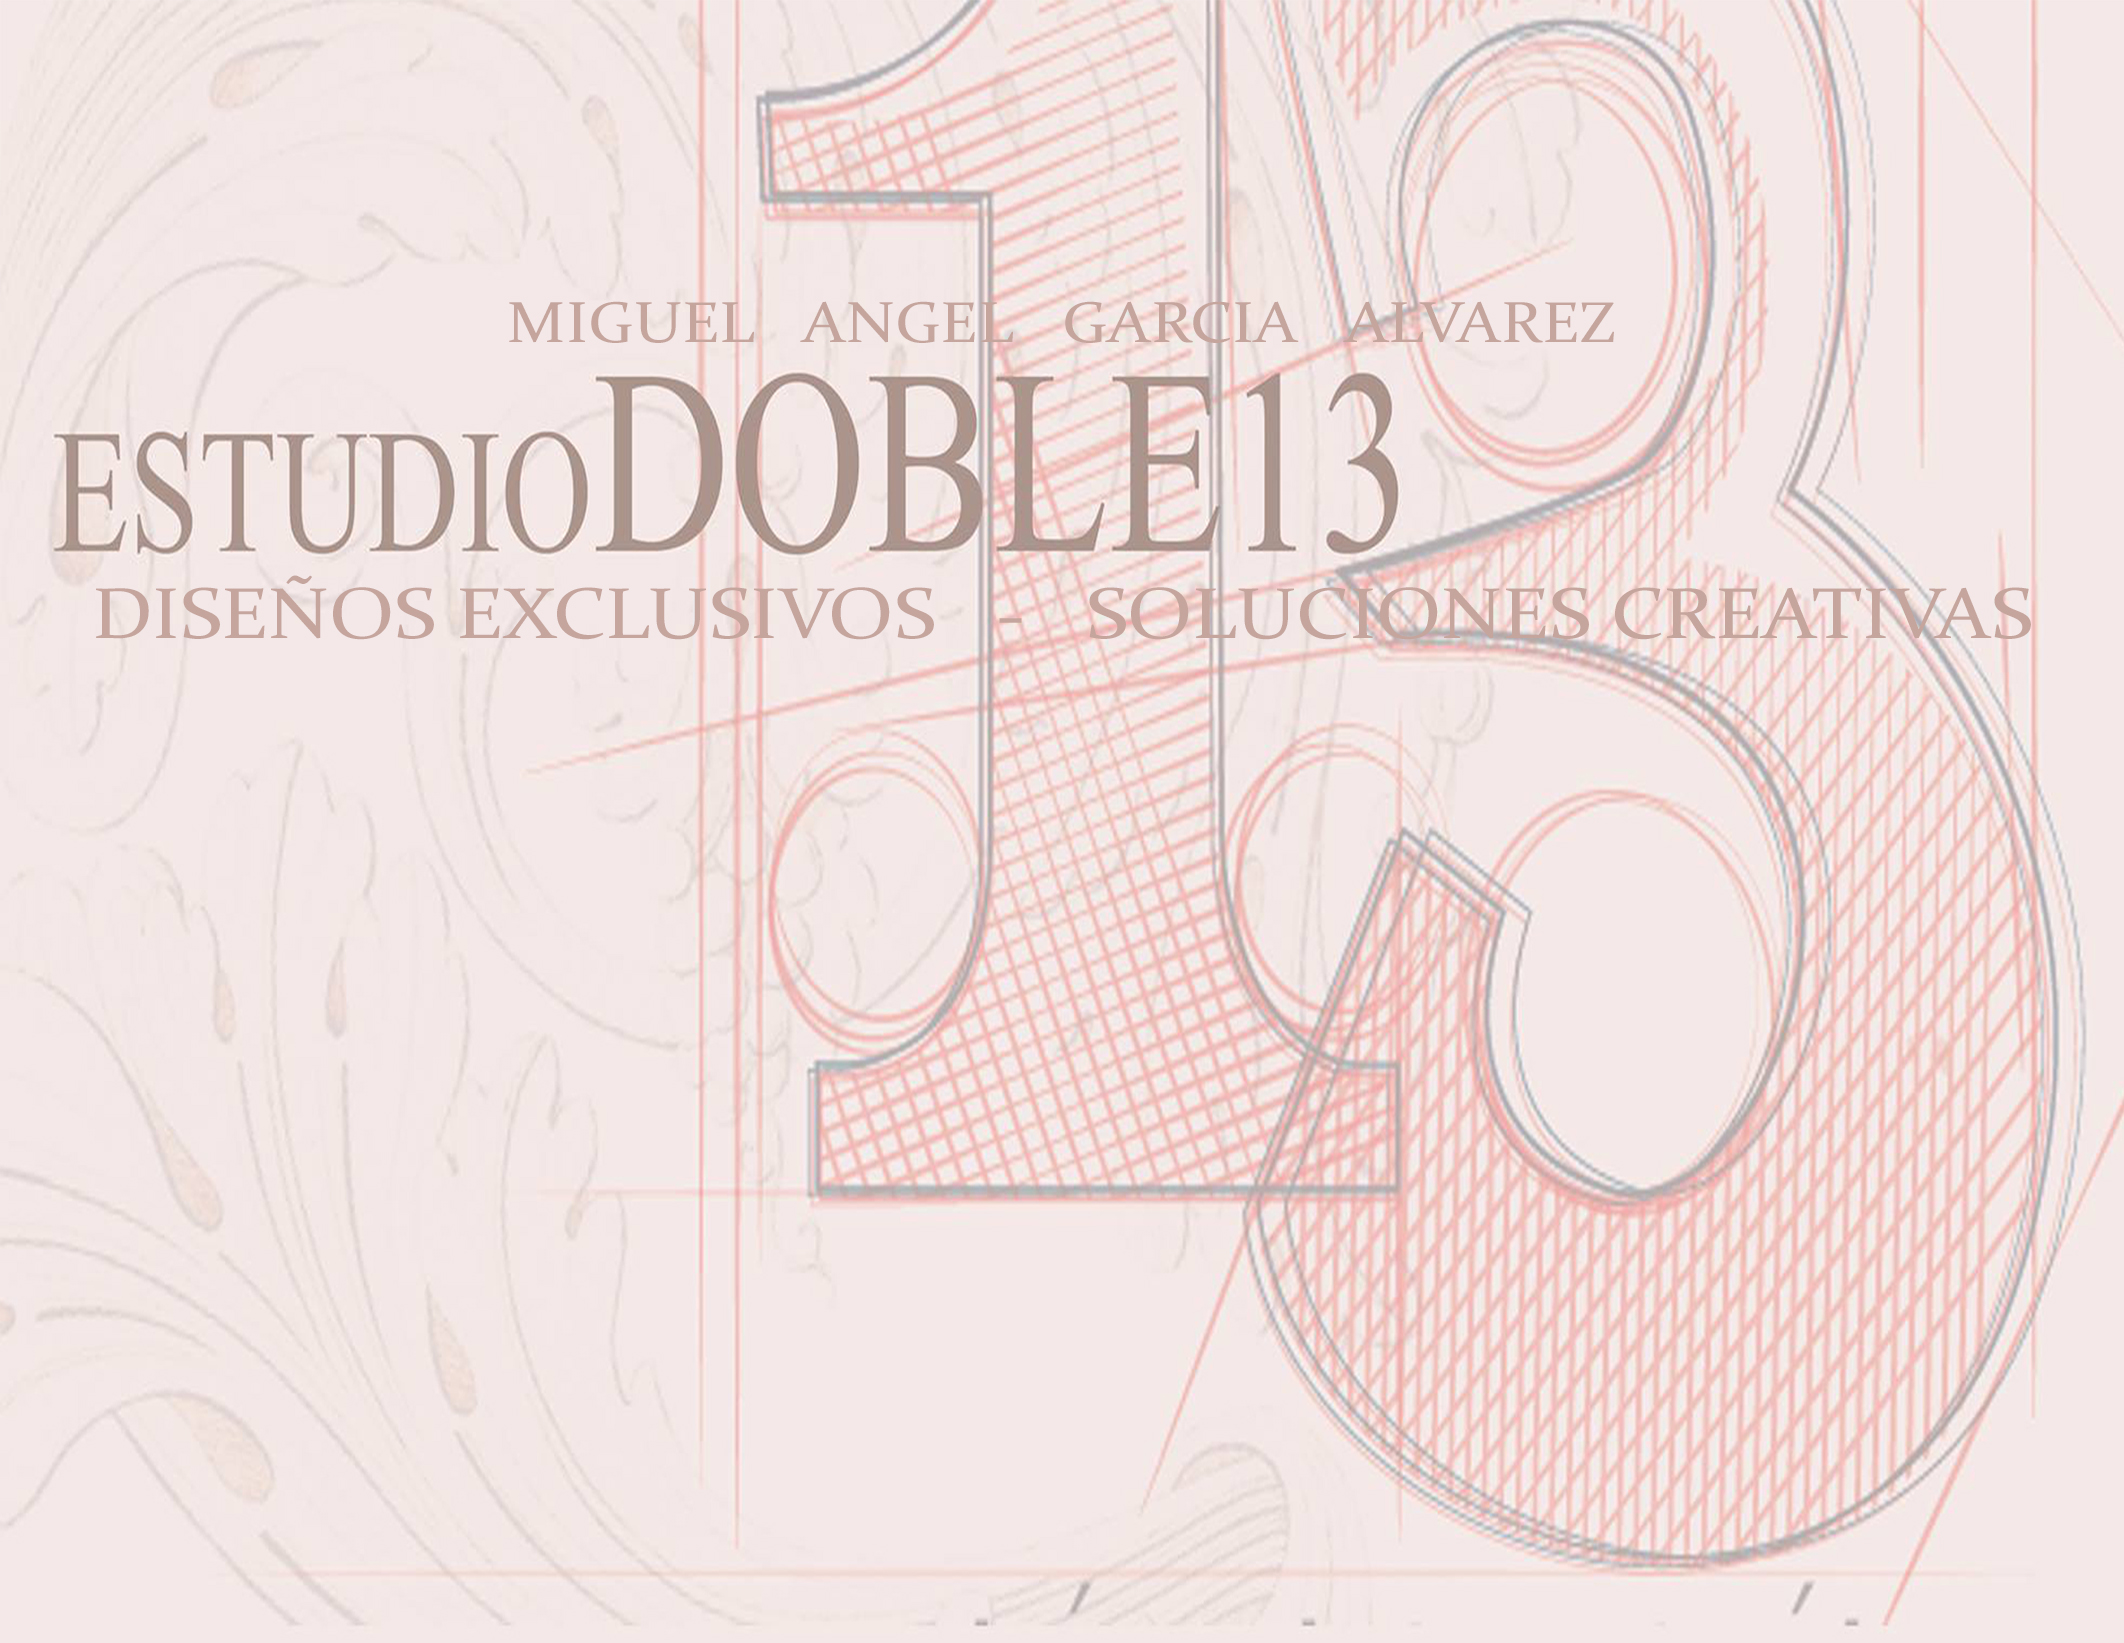 Estudio Doble13